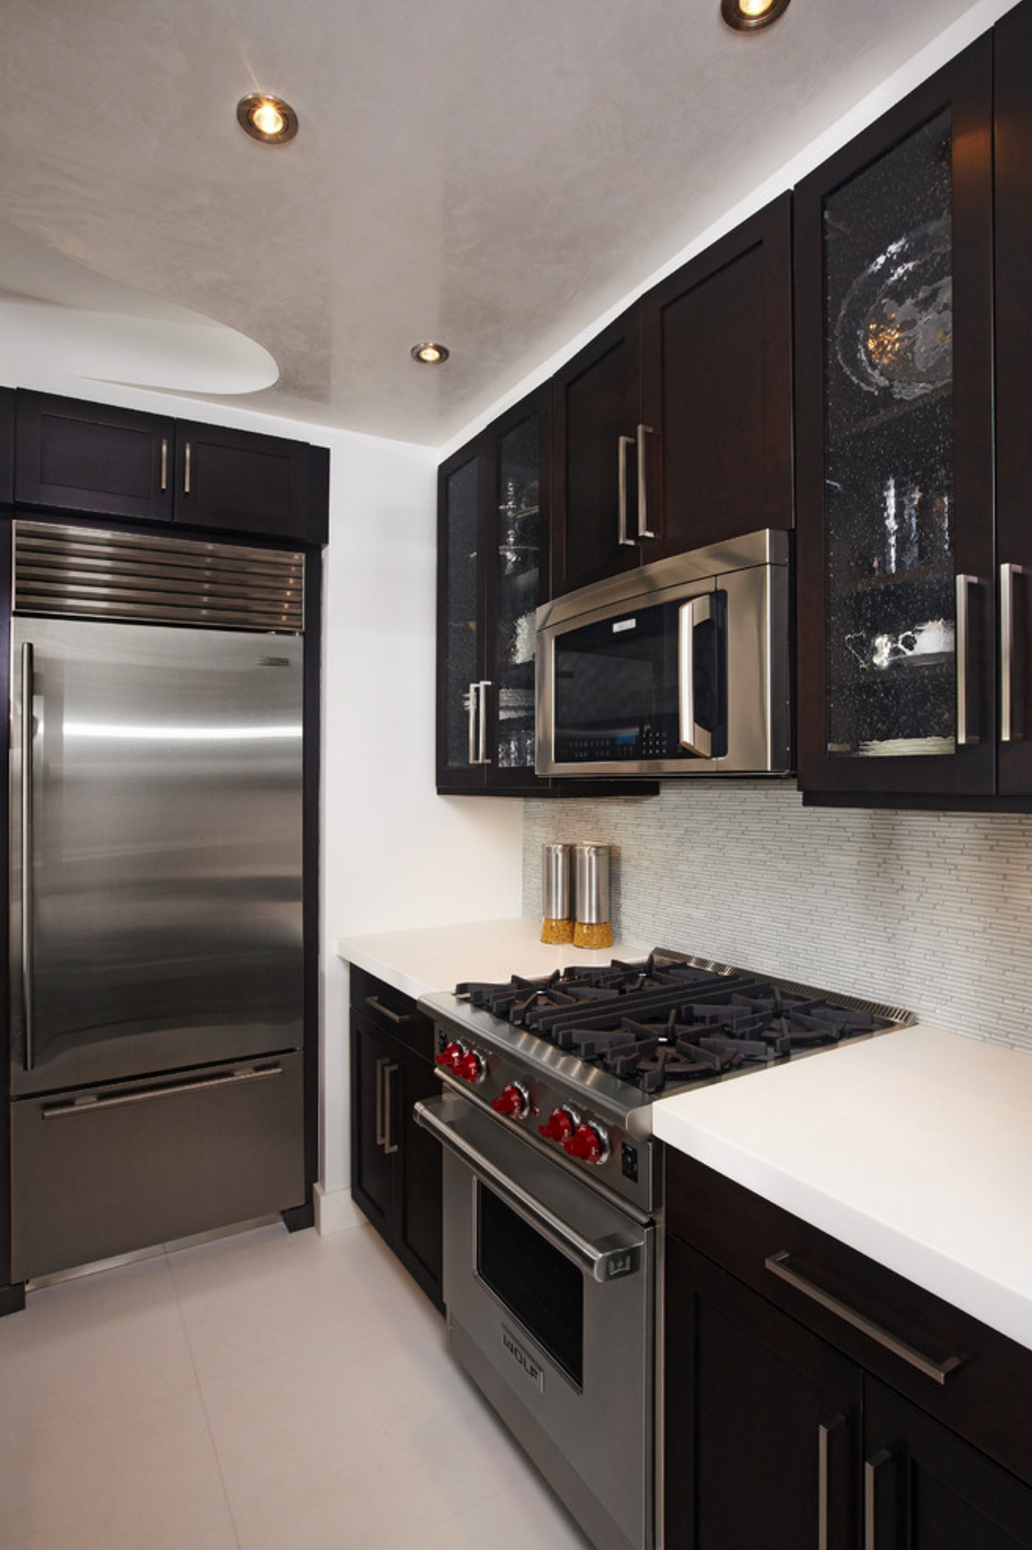 Kitchen Designers Nyc Prepossessing Pinjaye Cairo On Galley Kitchens  Pinterest  Galley Kitchens Design Ideas